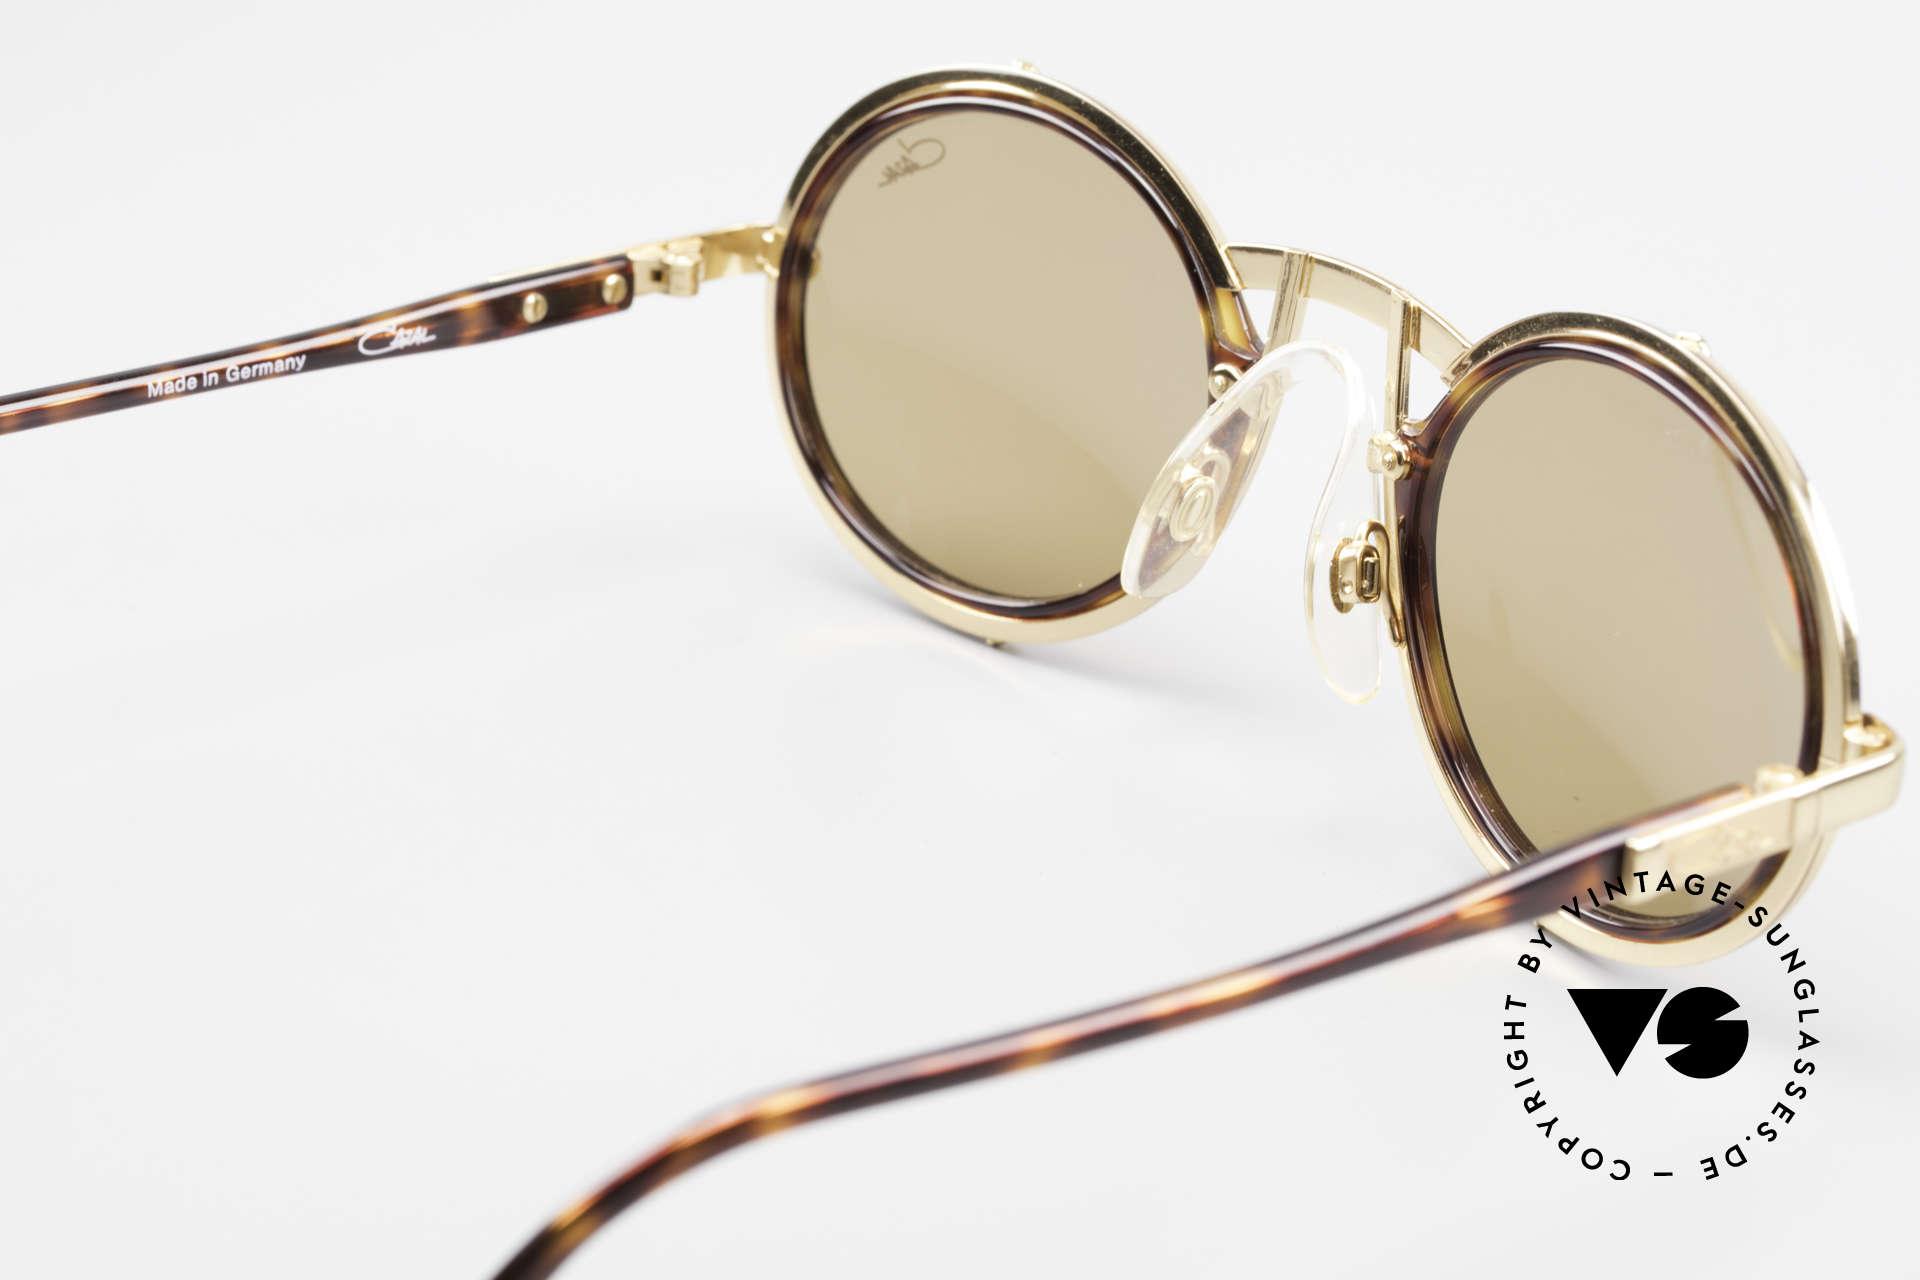 Cazal 644 Round Cazal 90's Sunglasses, Mr. Cari Zalloni (CaZal) wore this model in private, Made for Men and Women